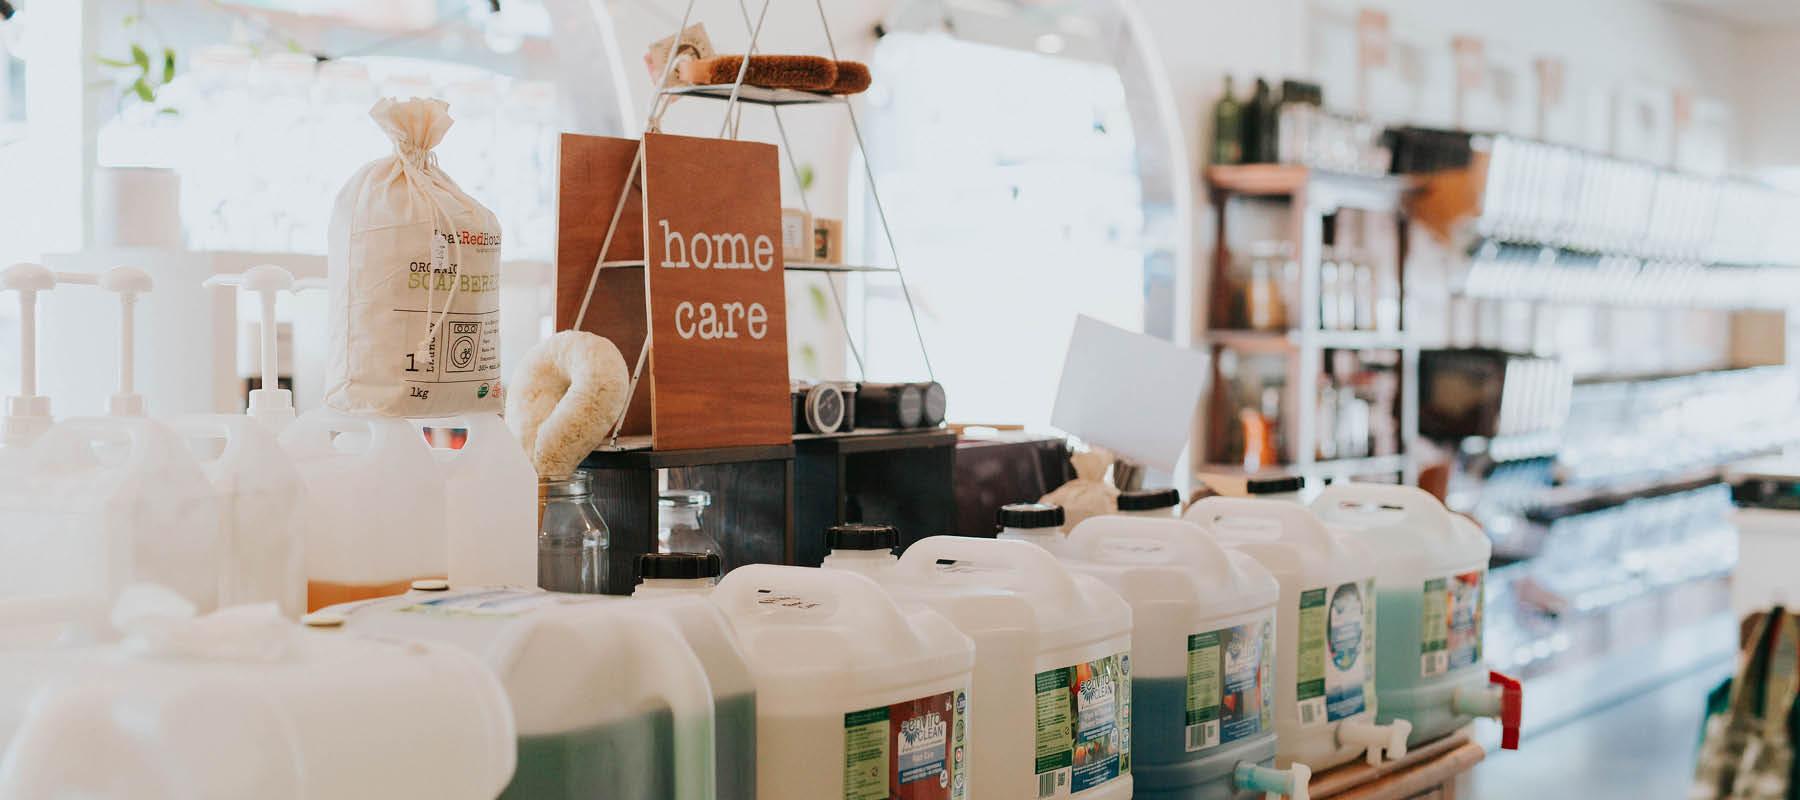 Replenish_Unpackaged_Living_Perth_Kalamunda_Waste_Free_Shopping_Bulk_Groceries_Sustainable_Zero_Wast_Wasteless_Goods_Whole_Foods_Plastic_Free_HOME_CARE_1.jpg